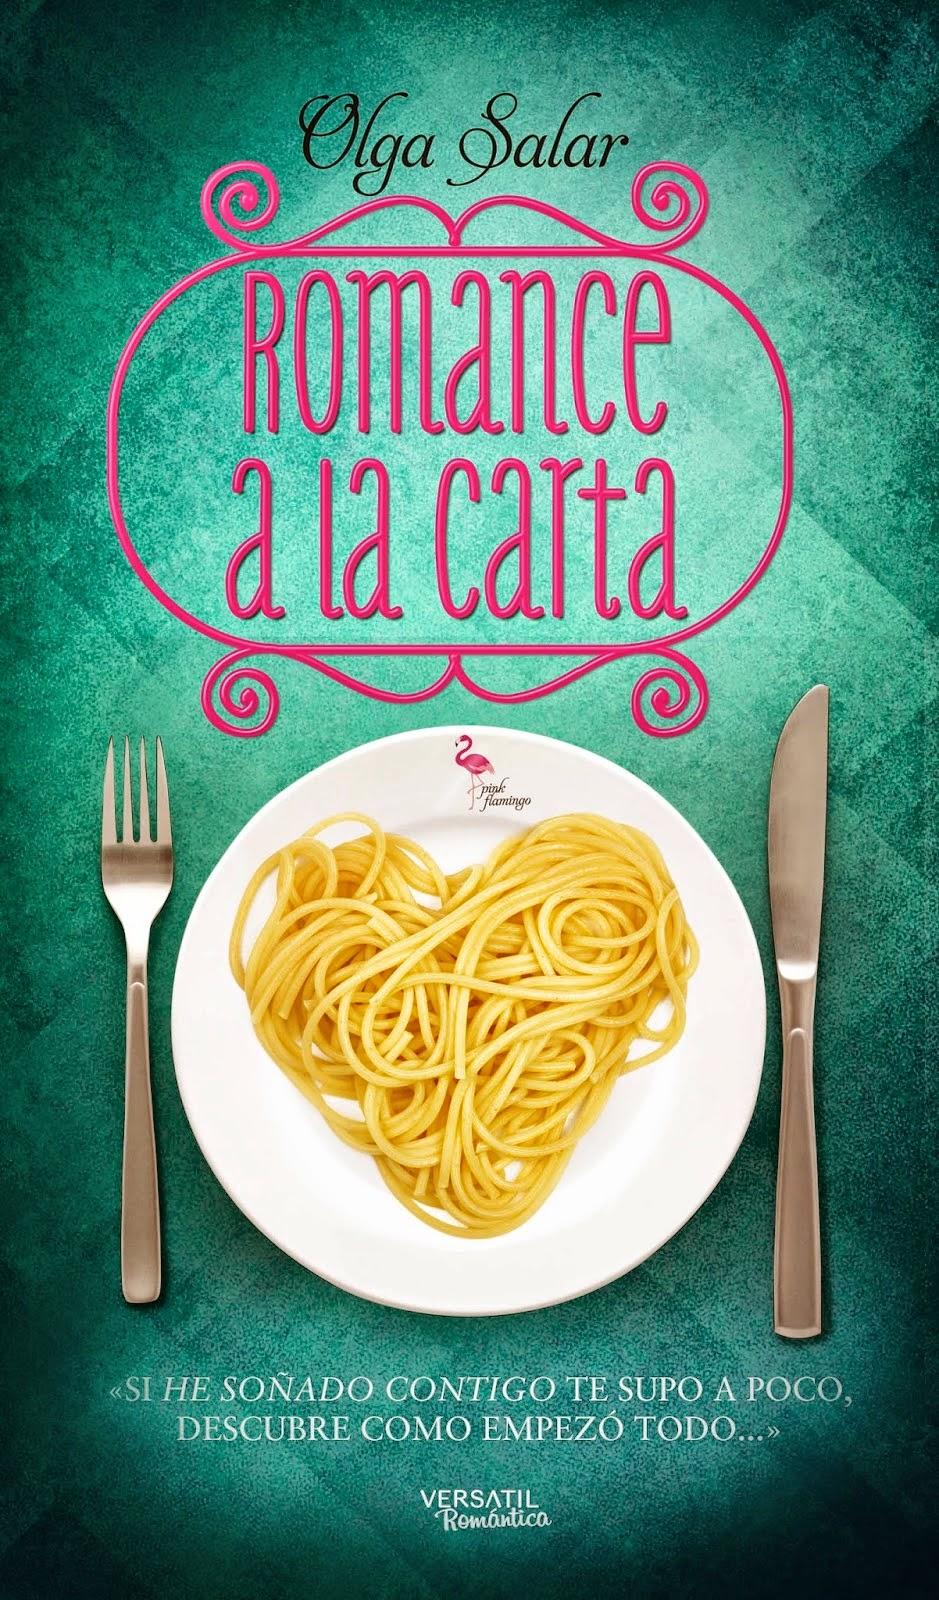 Romance a la carta - Hermanos Nash 01, Olga Salar (rom) Romace